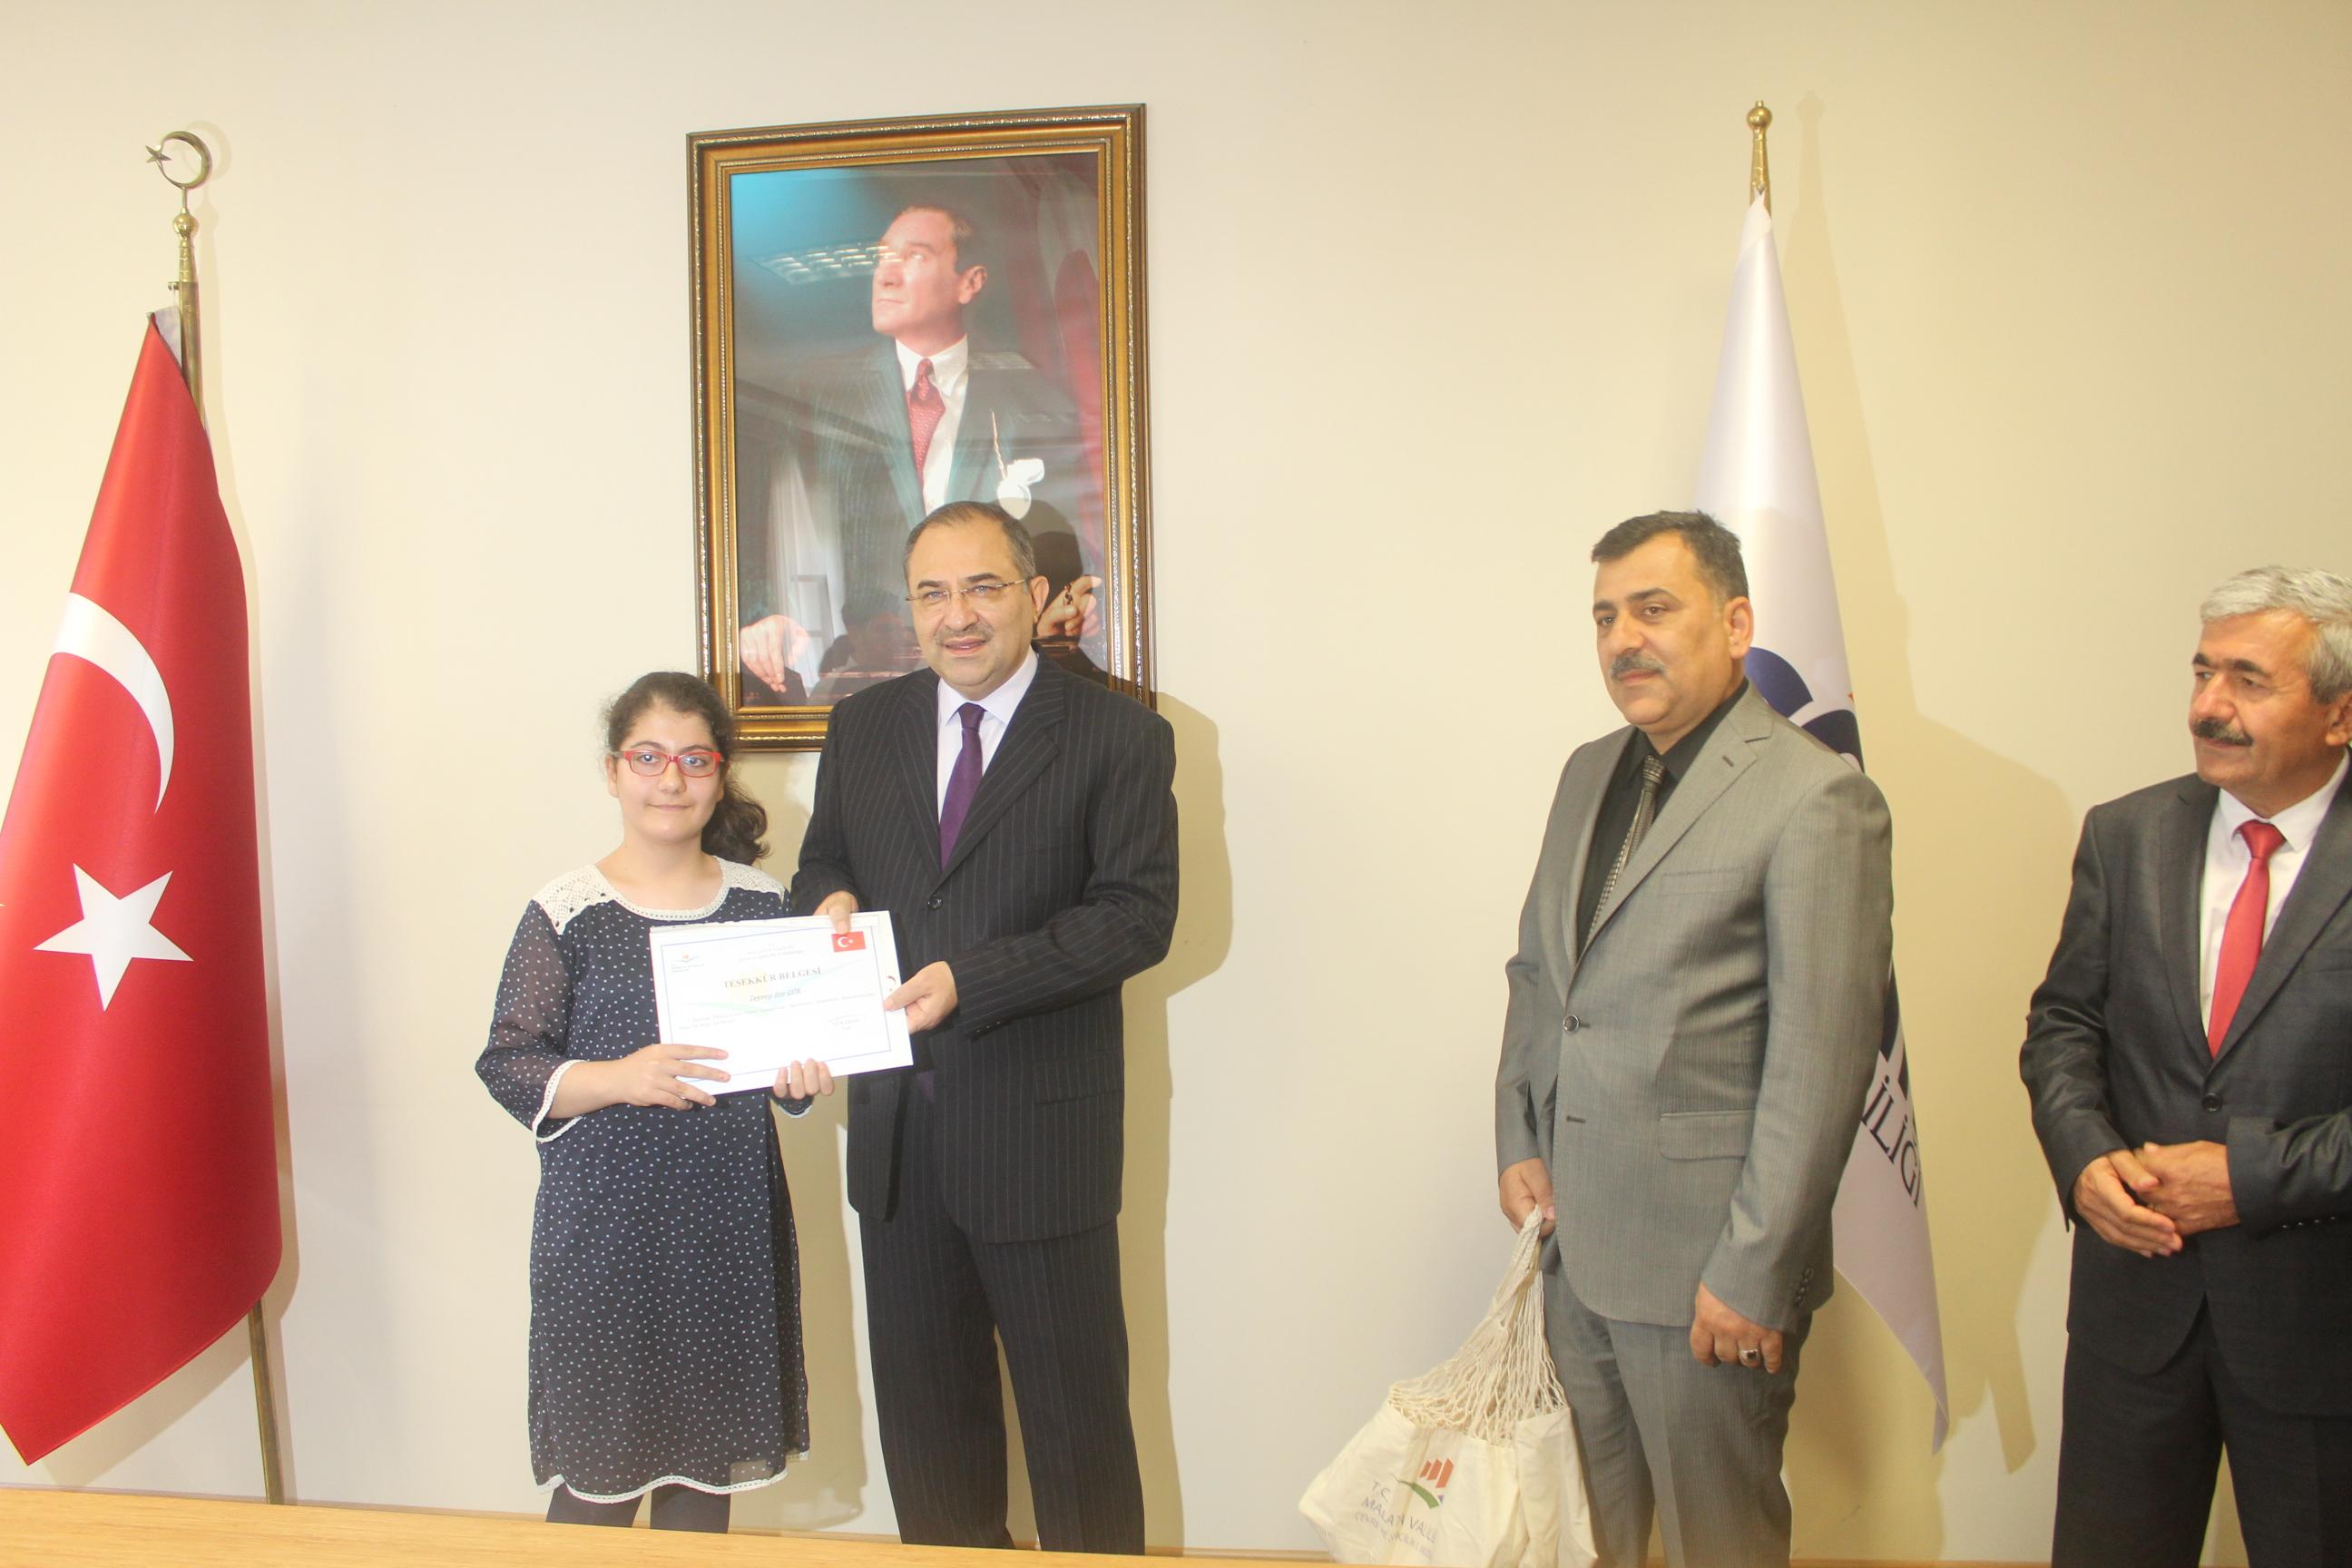 http://webdosya.csb.gov.tr/db/malatya/haberler/img_8591-20180607124558.JPG